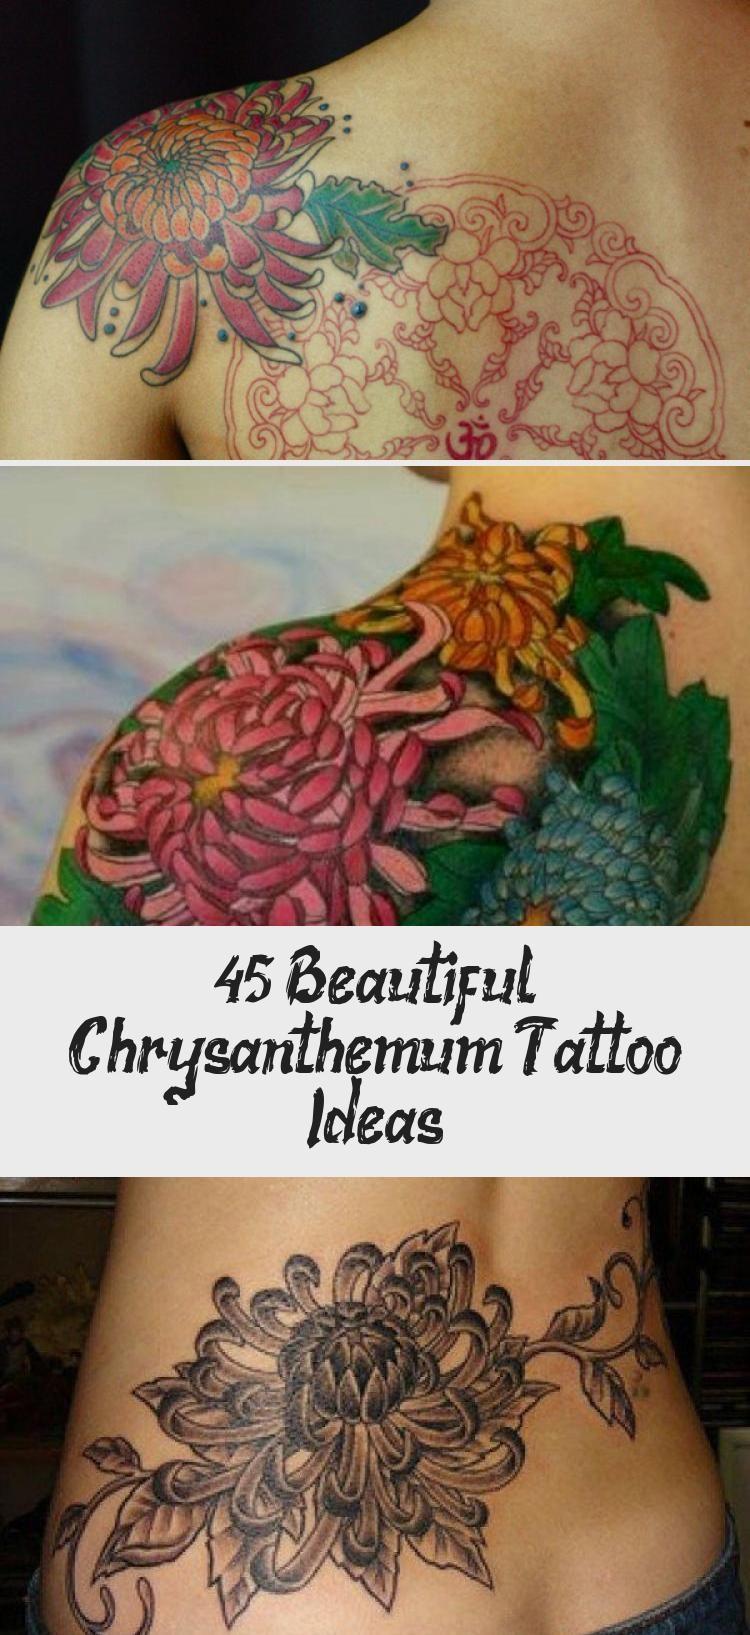 Chrysanthemum Shoulder Tattoo - 45 Beautiful Chrysanthemum Tattoo Ideas <3 <3